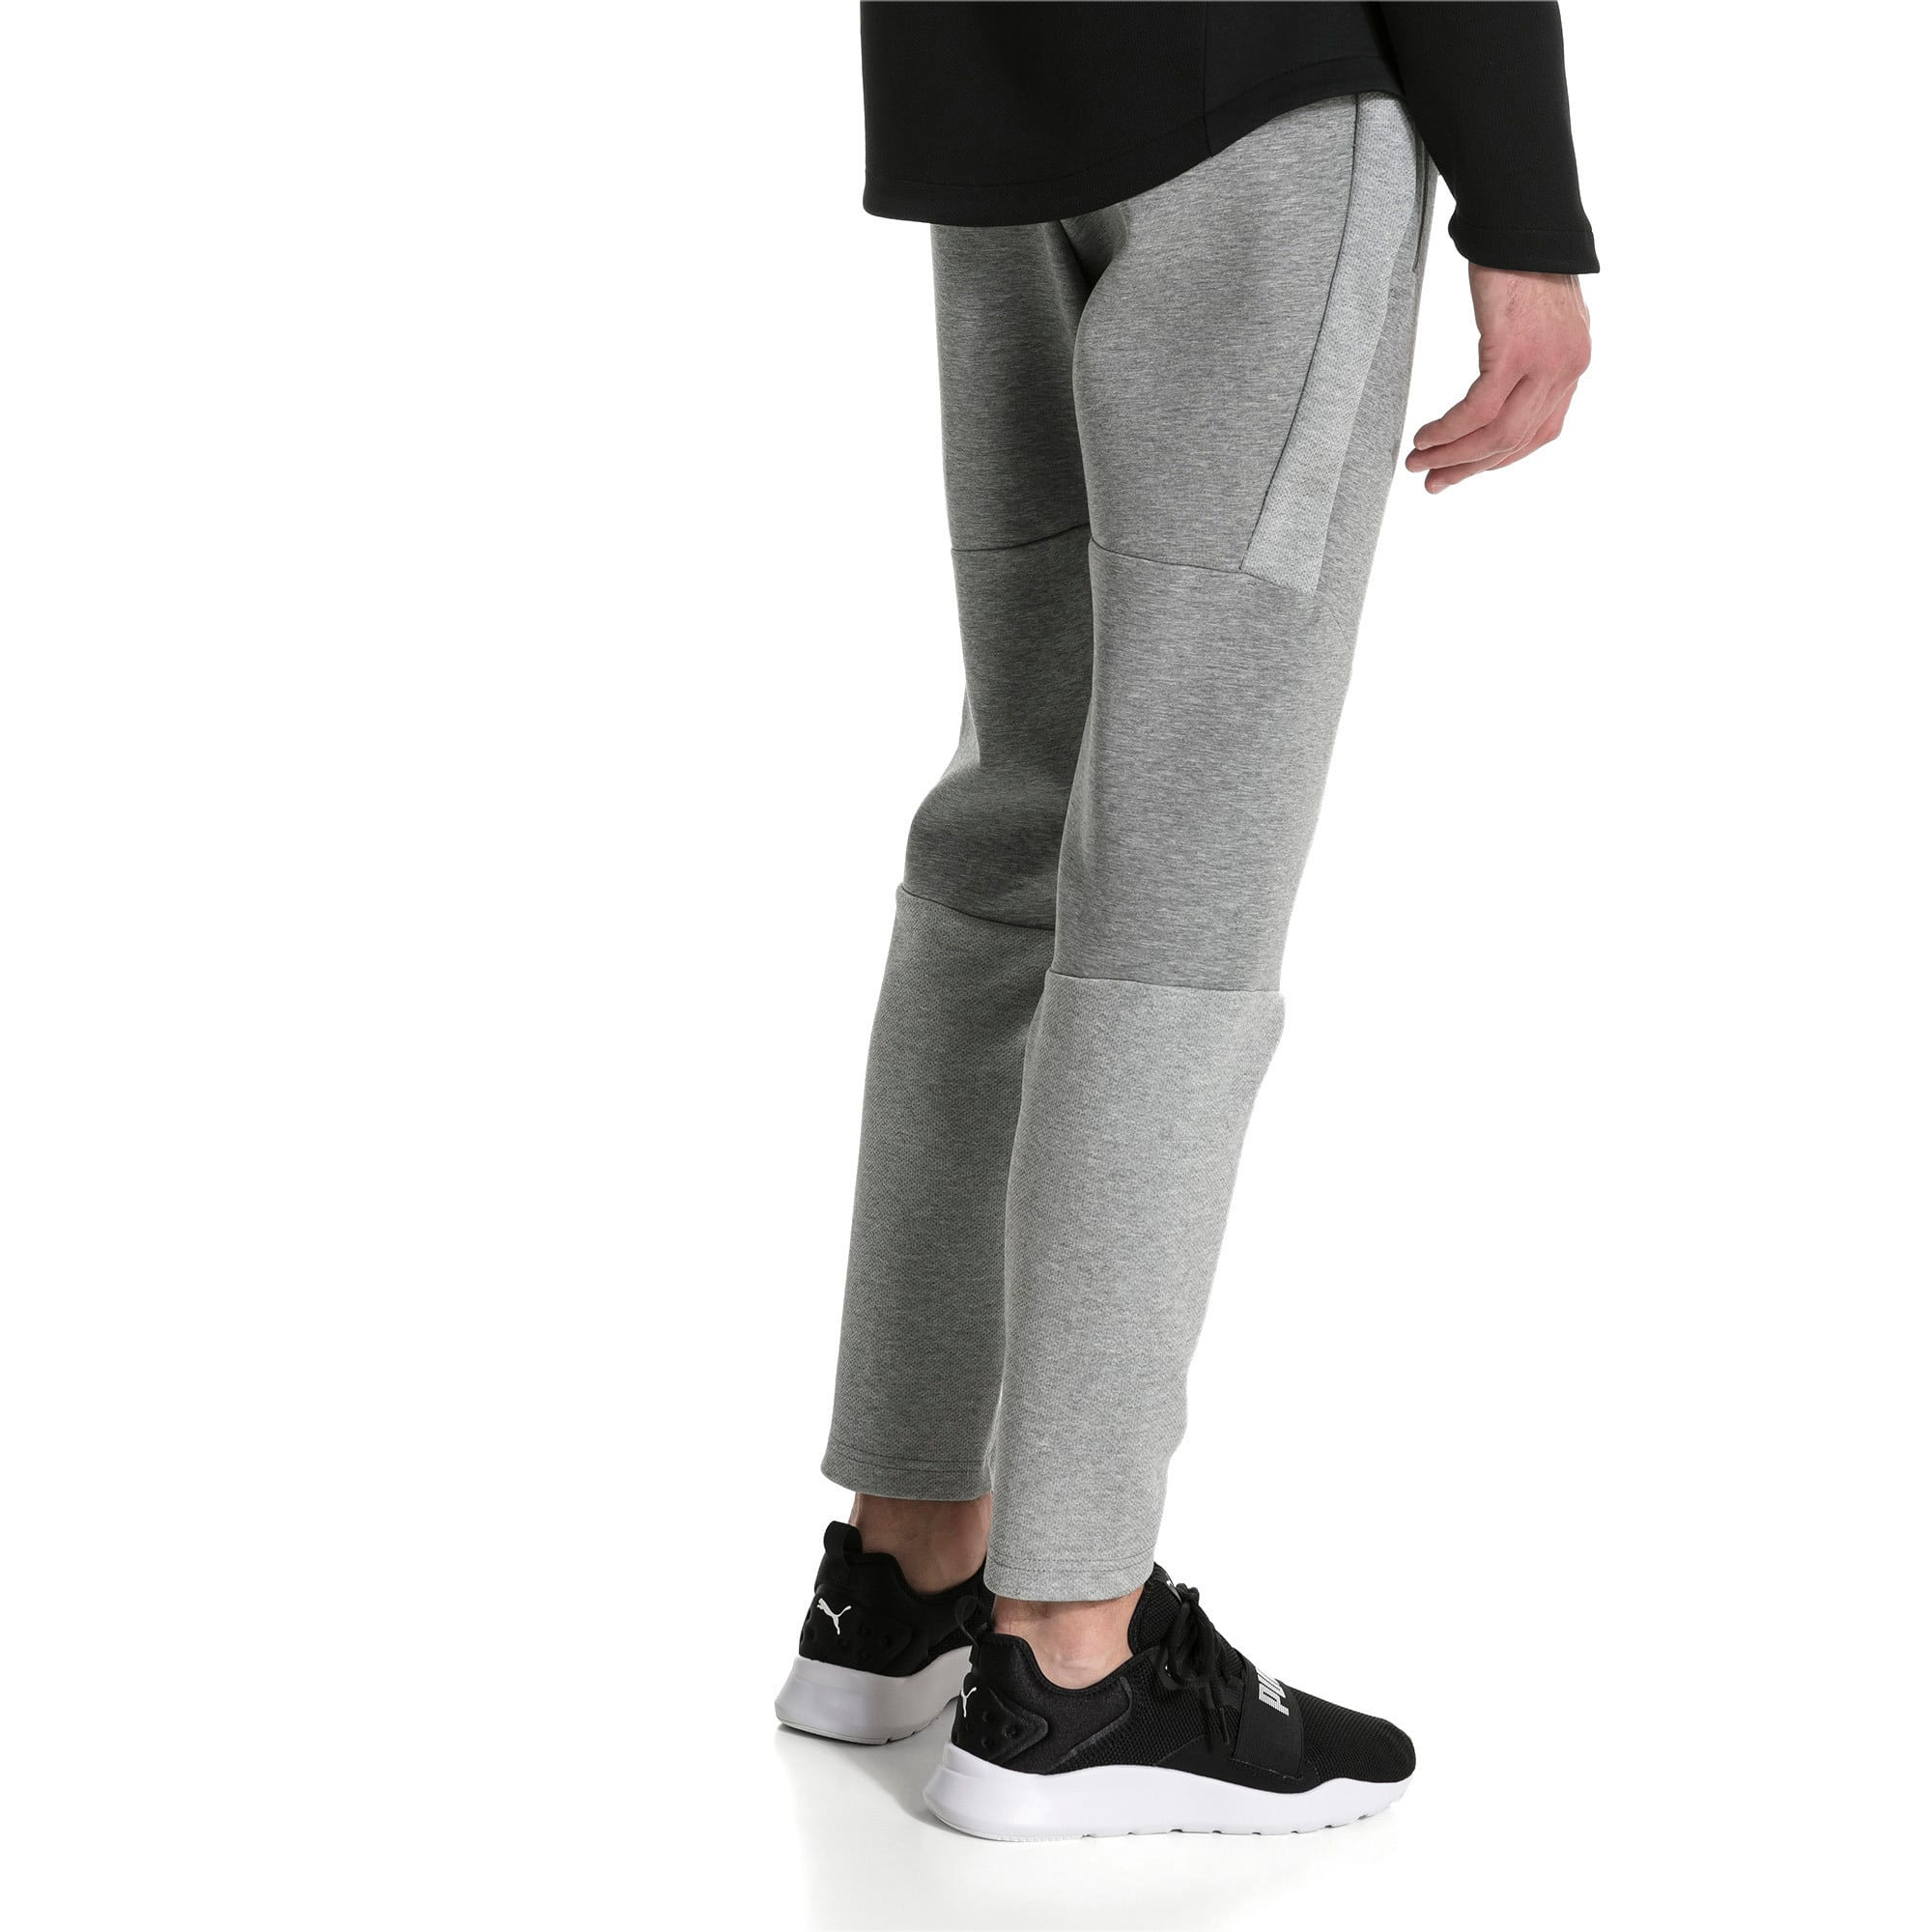 Thumbnail 2 of Evostripe Move Knitted Men's Pants, Medium Gray Heather, medium